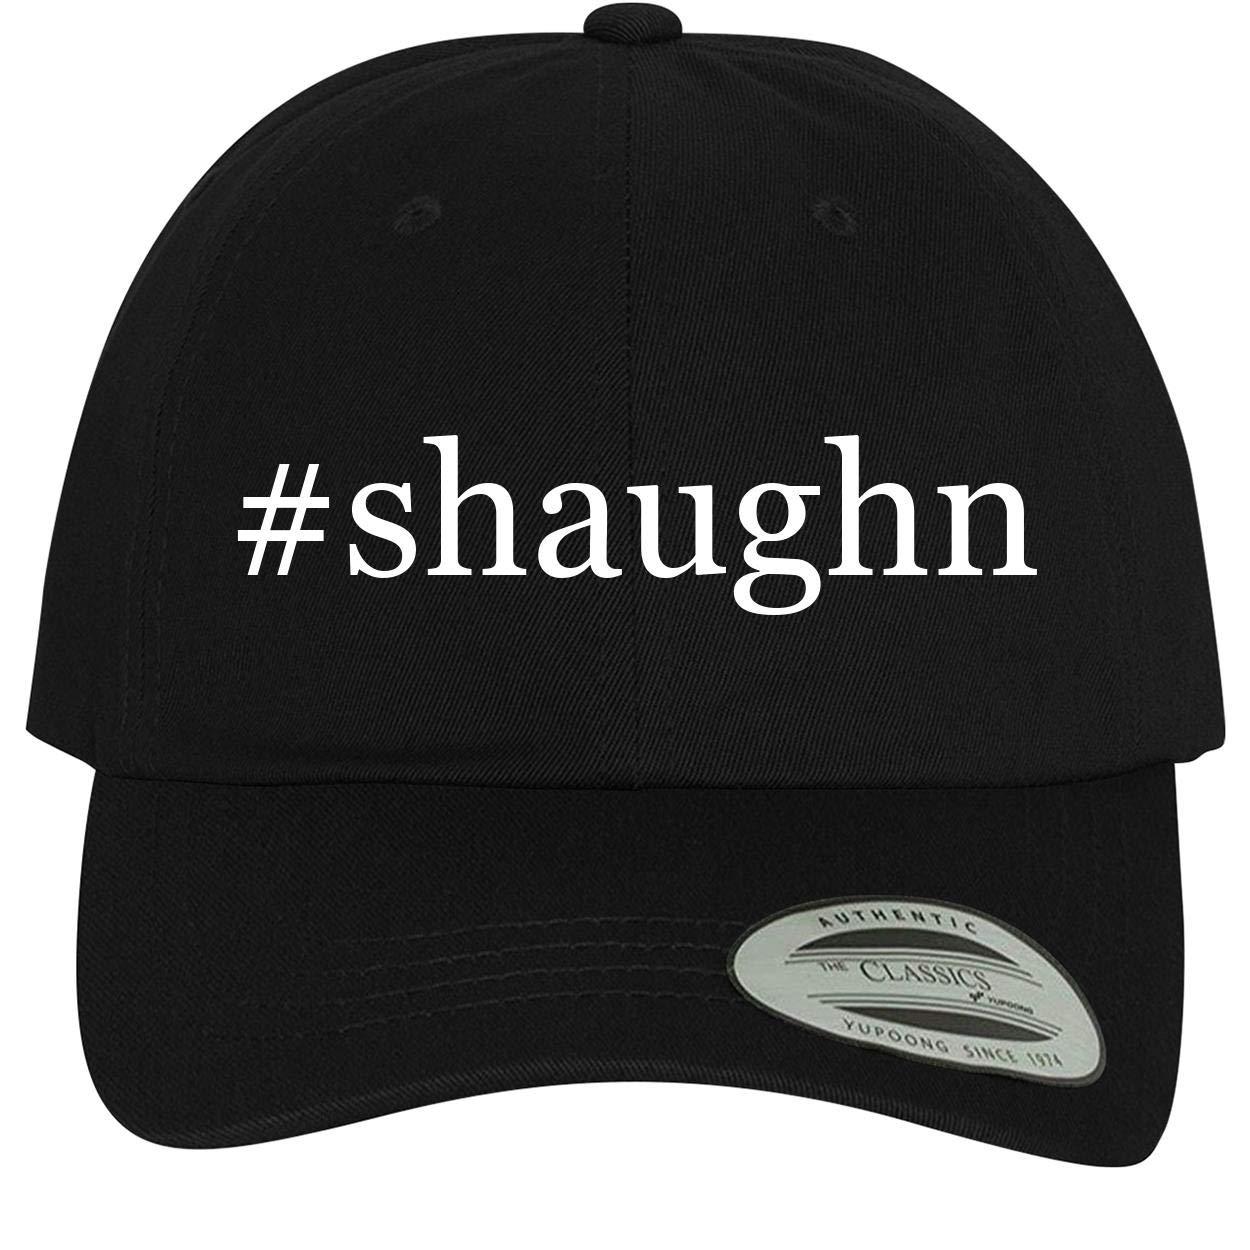 Comfortable Dad Hat Baseball Cap BH Cool Designs #Shaughn